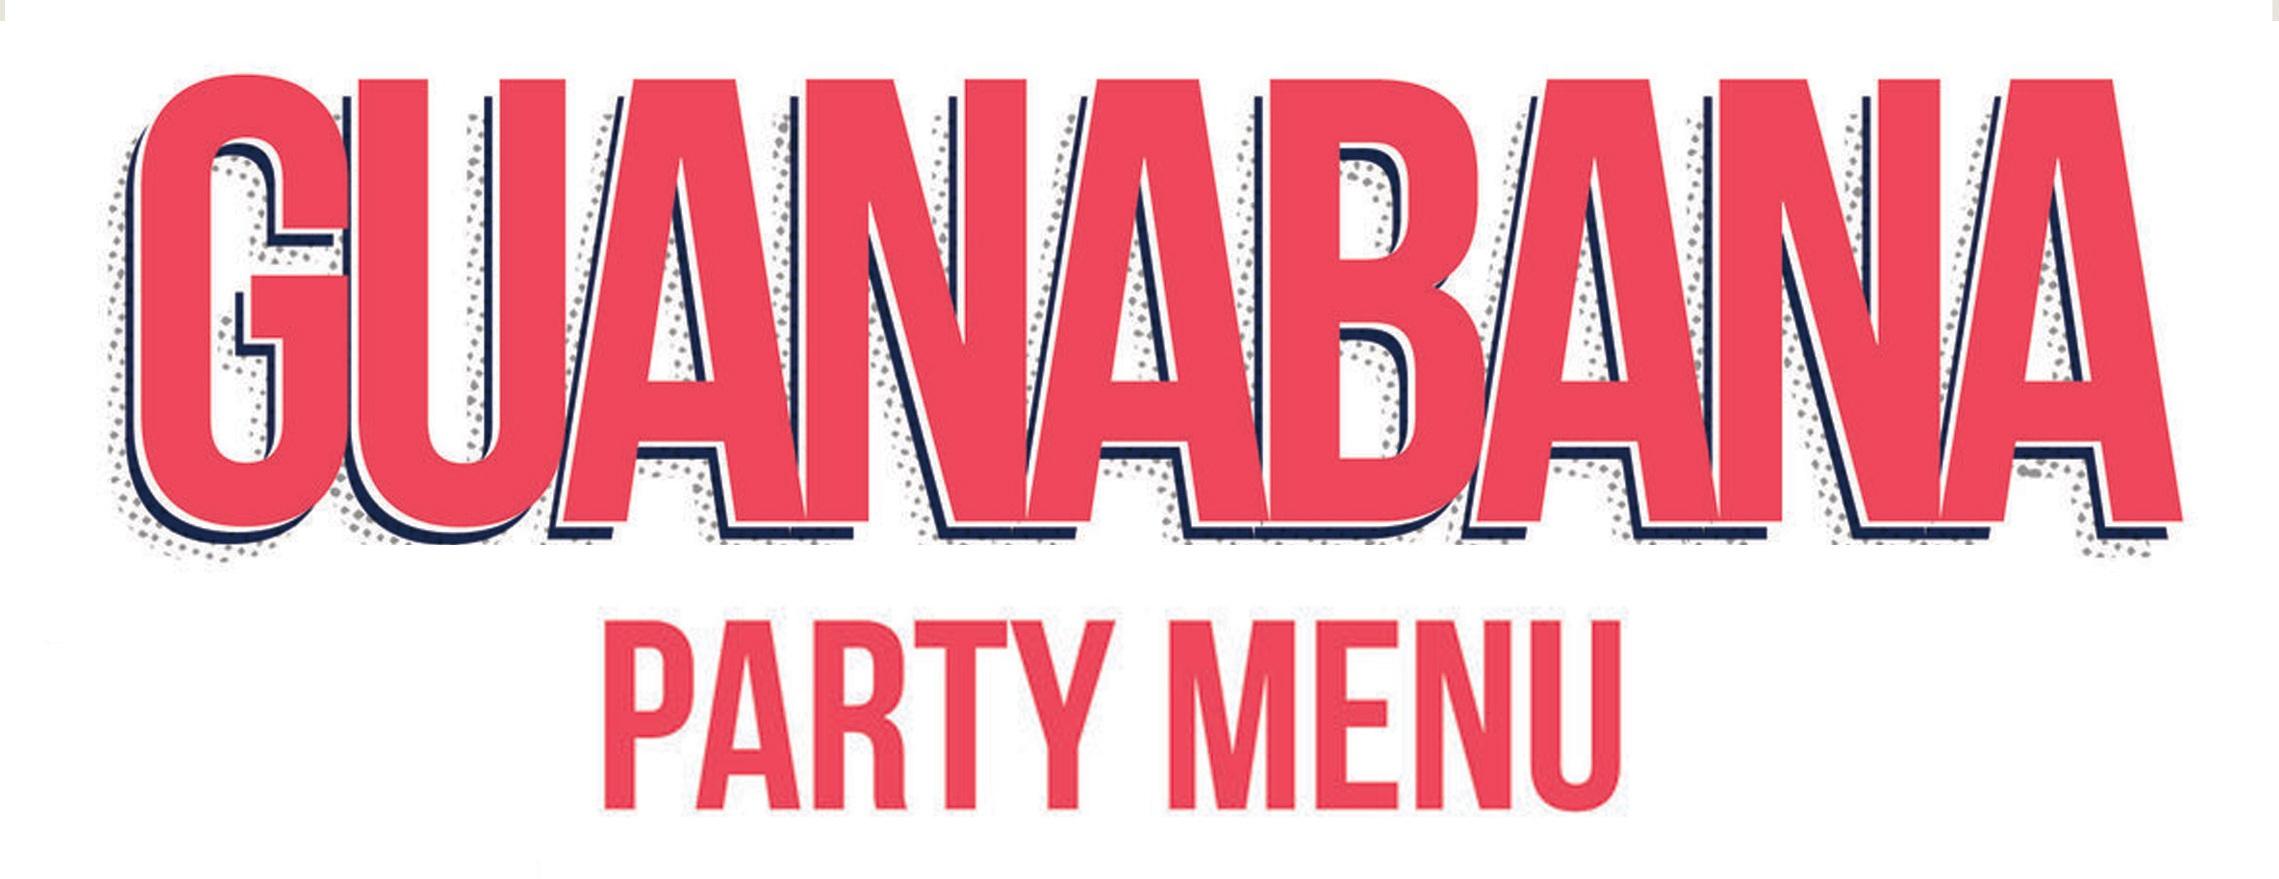 GUANABANA-PARTY.jpg